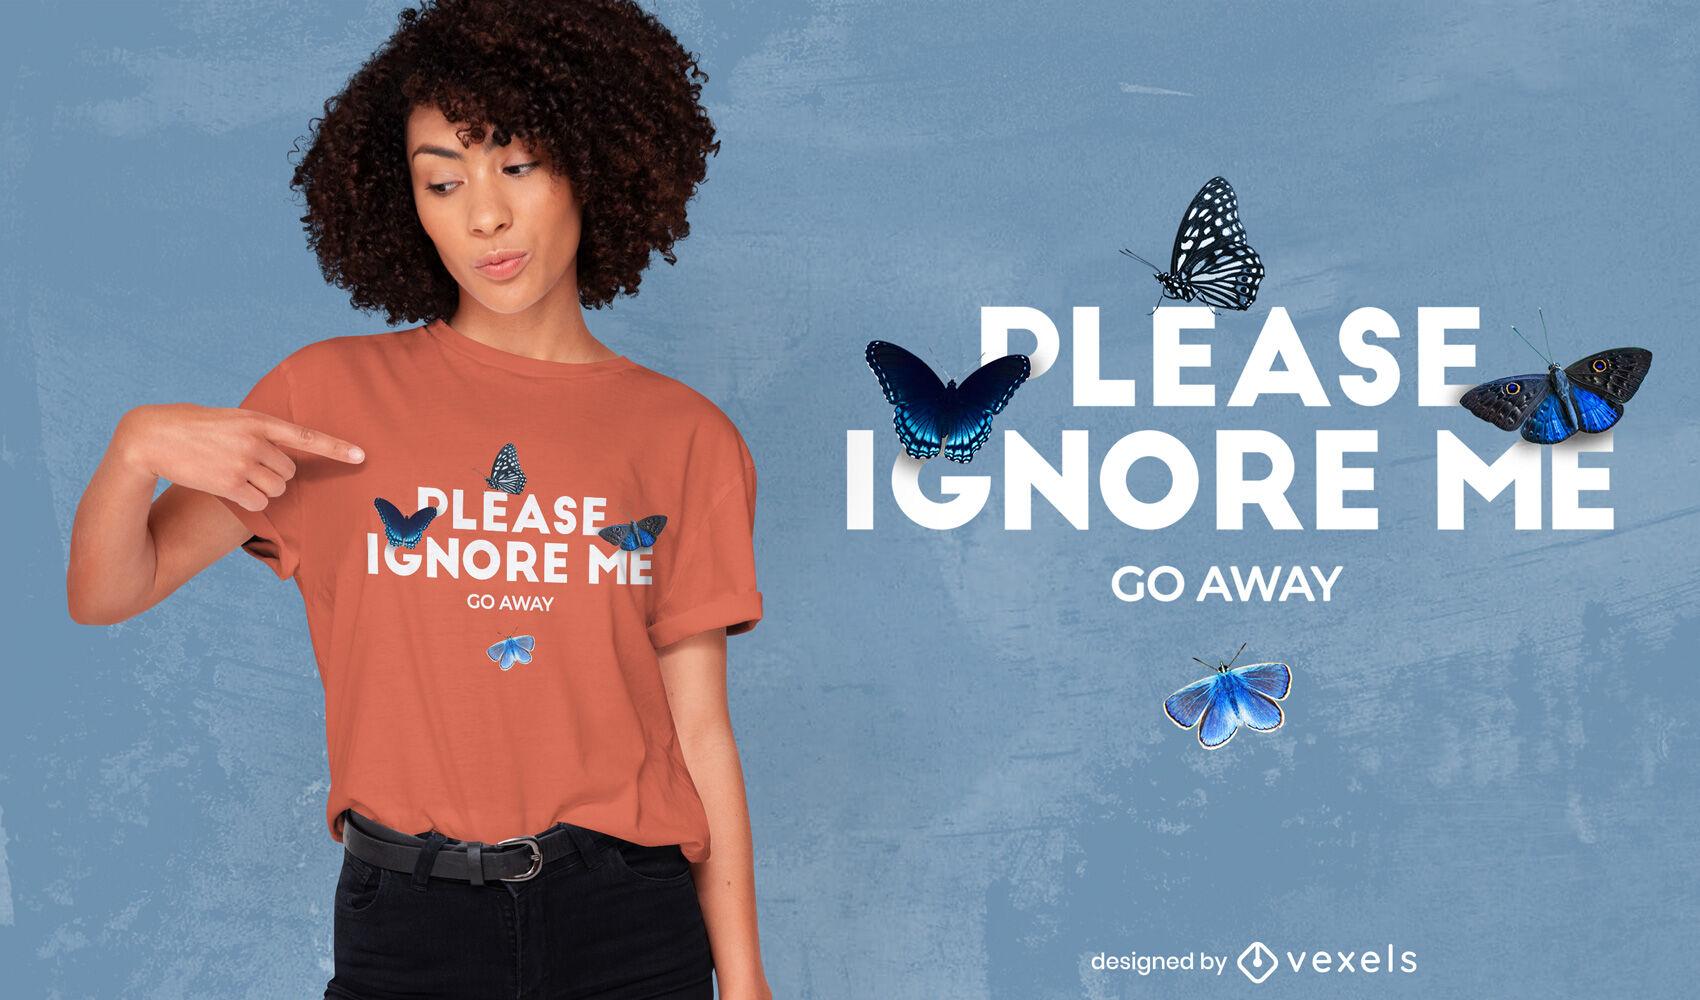 Ignórame mariposas psd diseño de camiseta